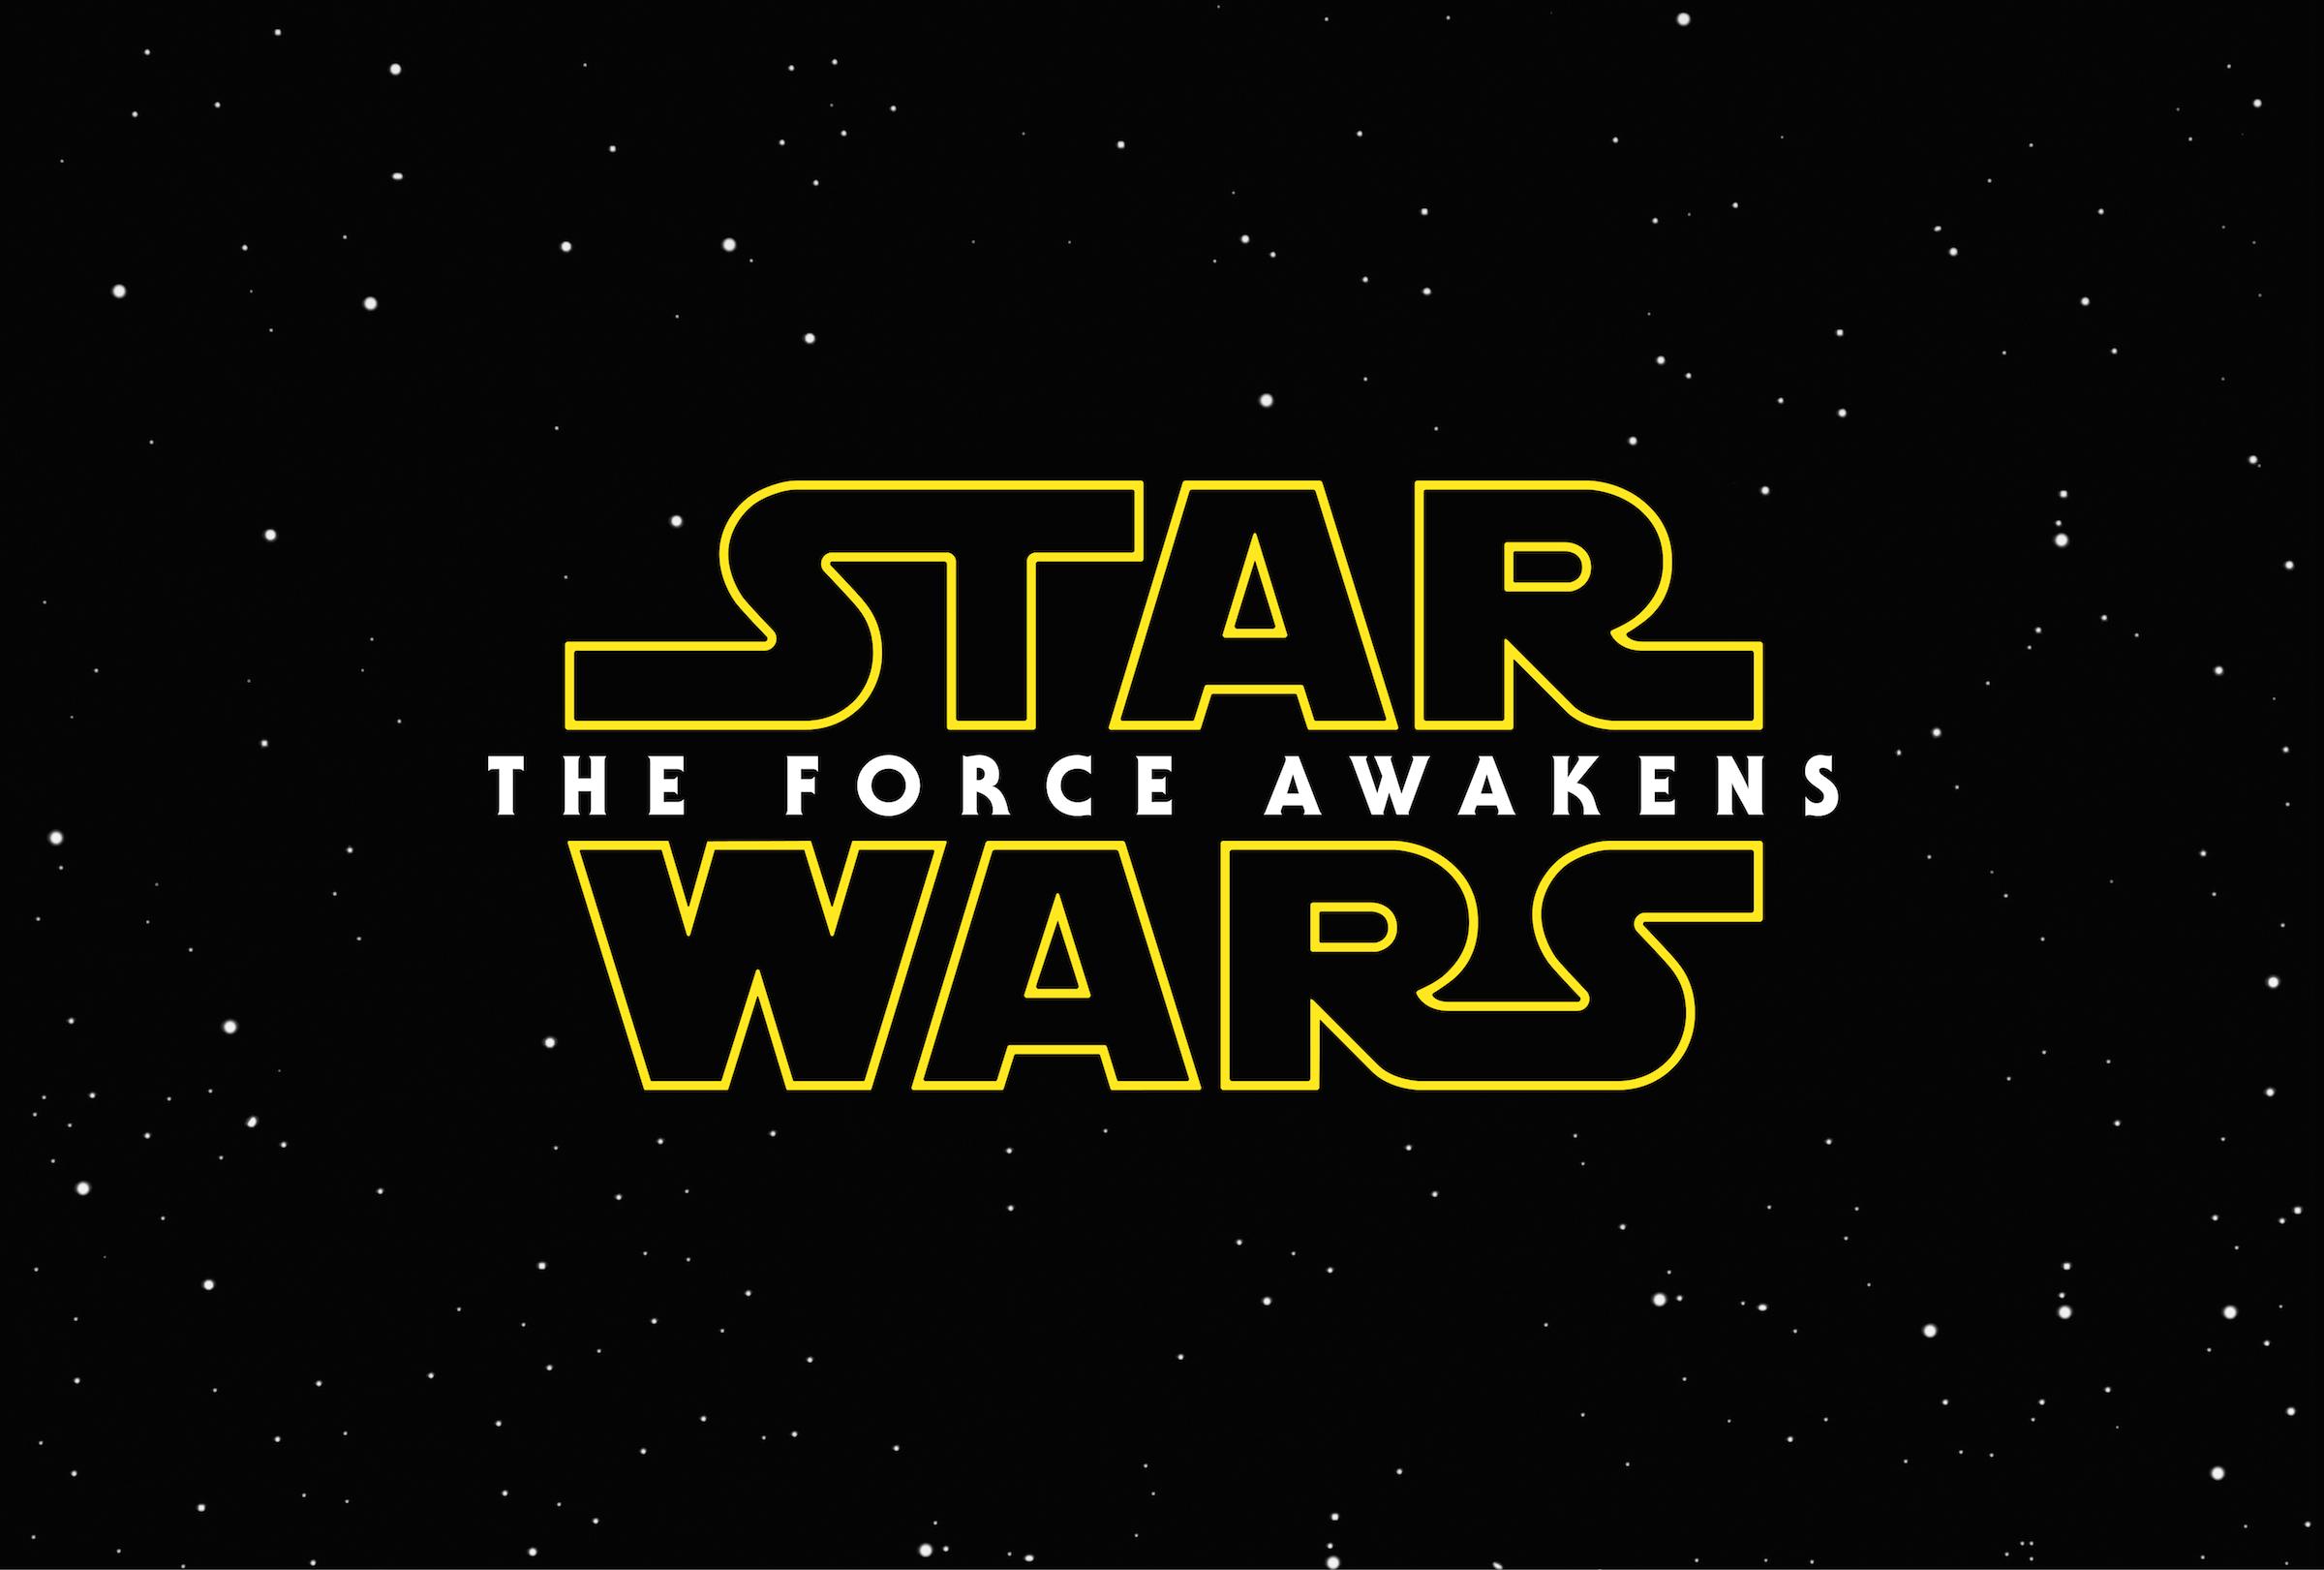 https://vignette2.wikia.nocookie.net/starwars/images/4/49/Star_Wars_The_Force_Awakens.jpg/revision/latest?cb=20150504052358